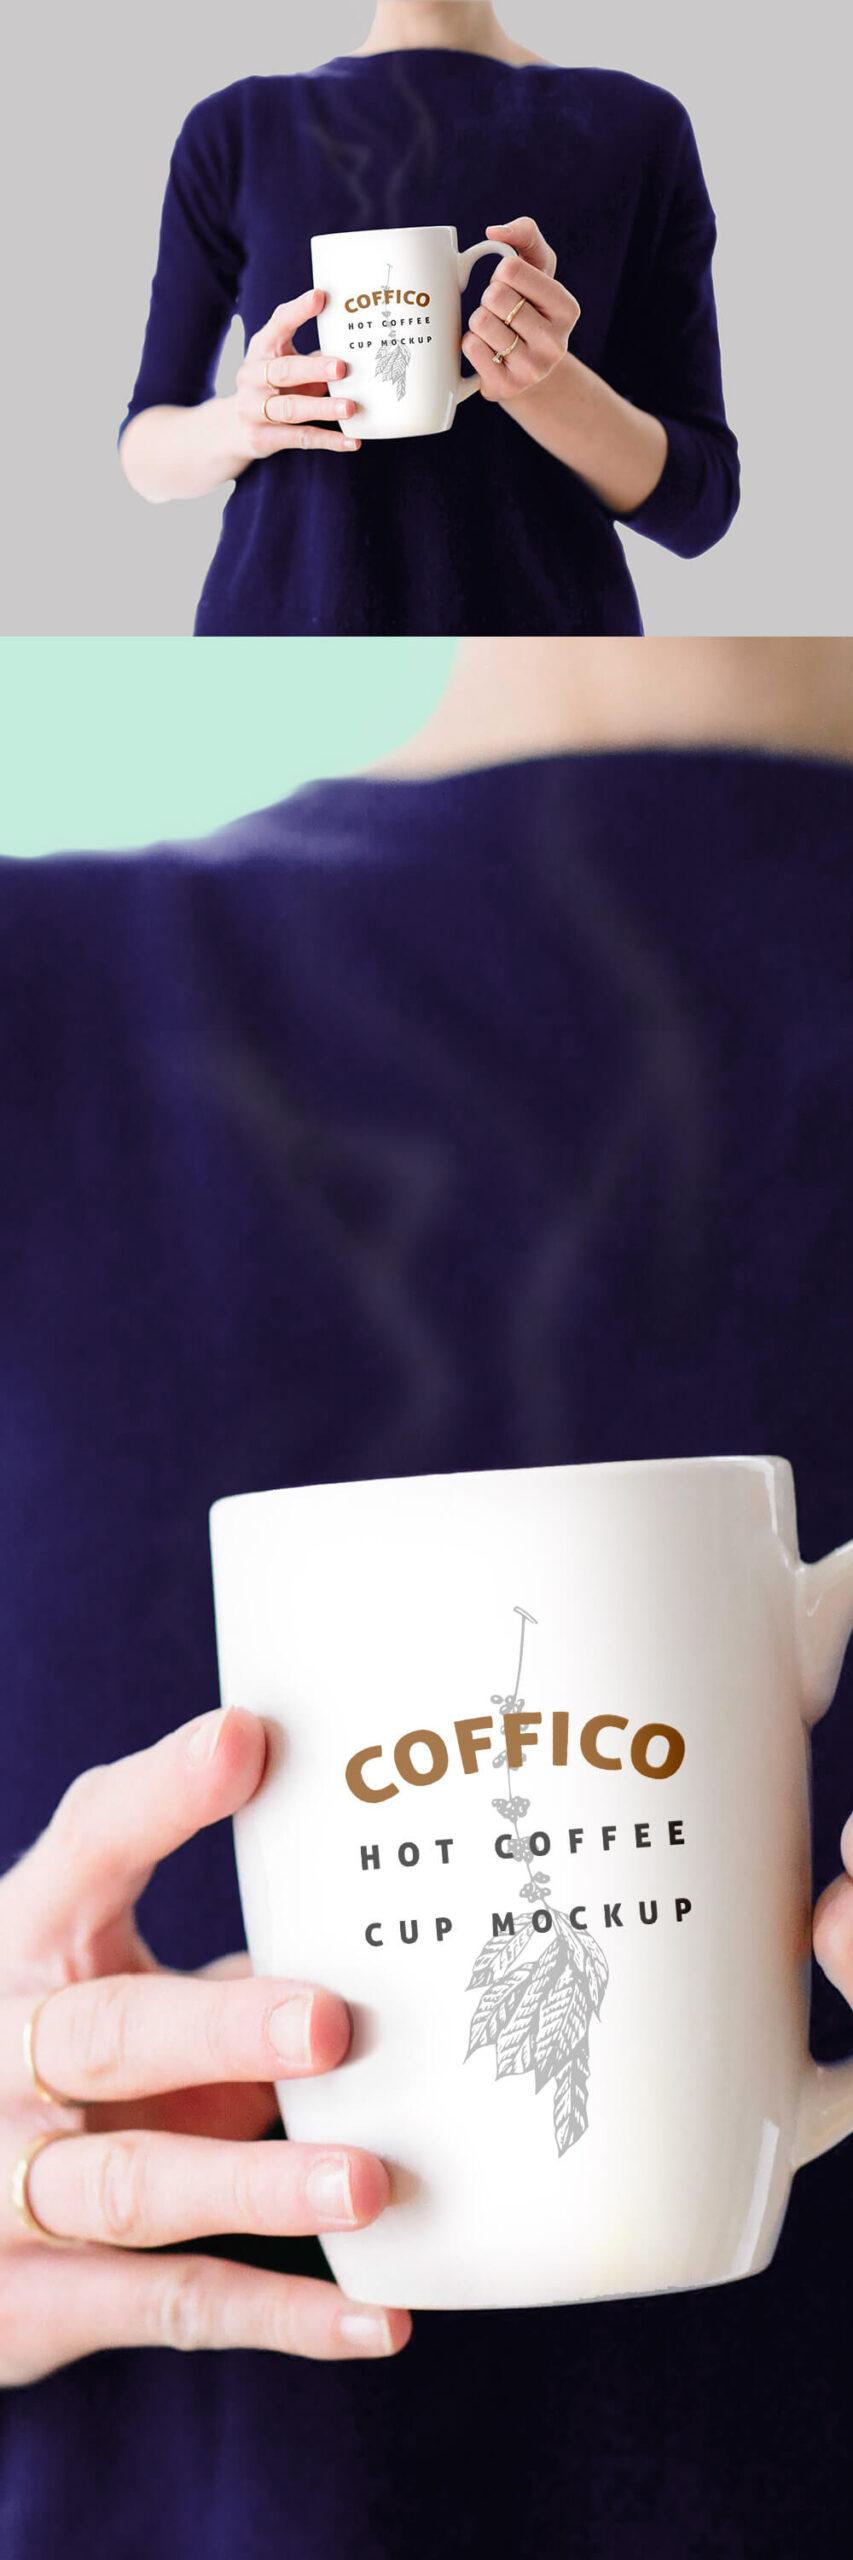 Free Woman Holding a Coffee Mug Mockup PSD Template